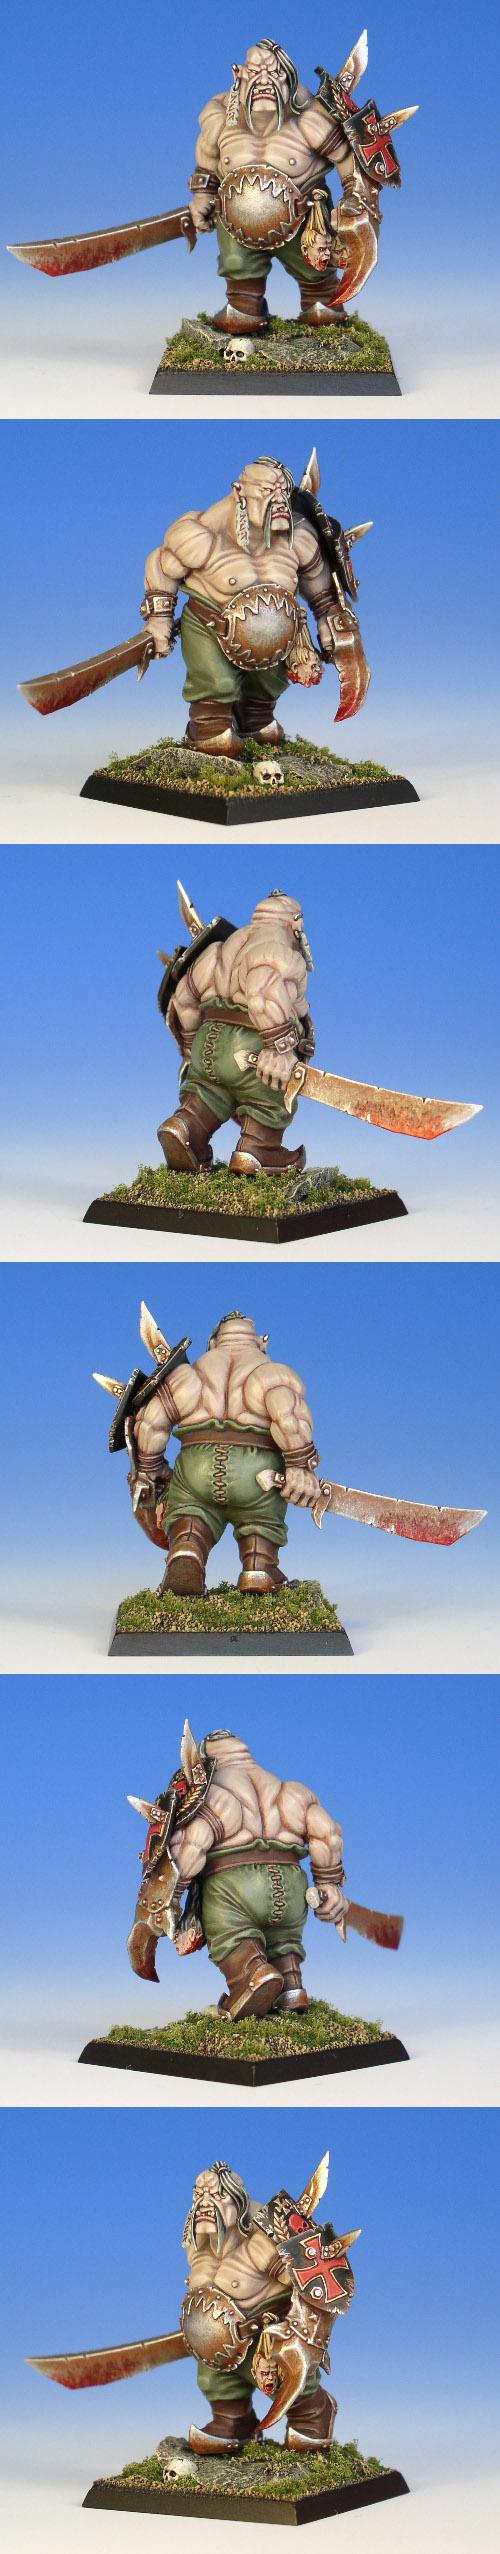 Ogre Kingdoms Maneater conversion